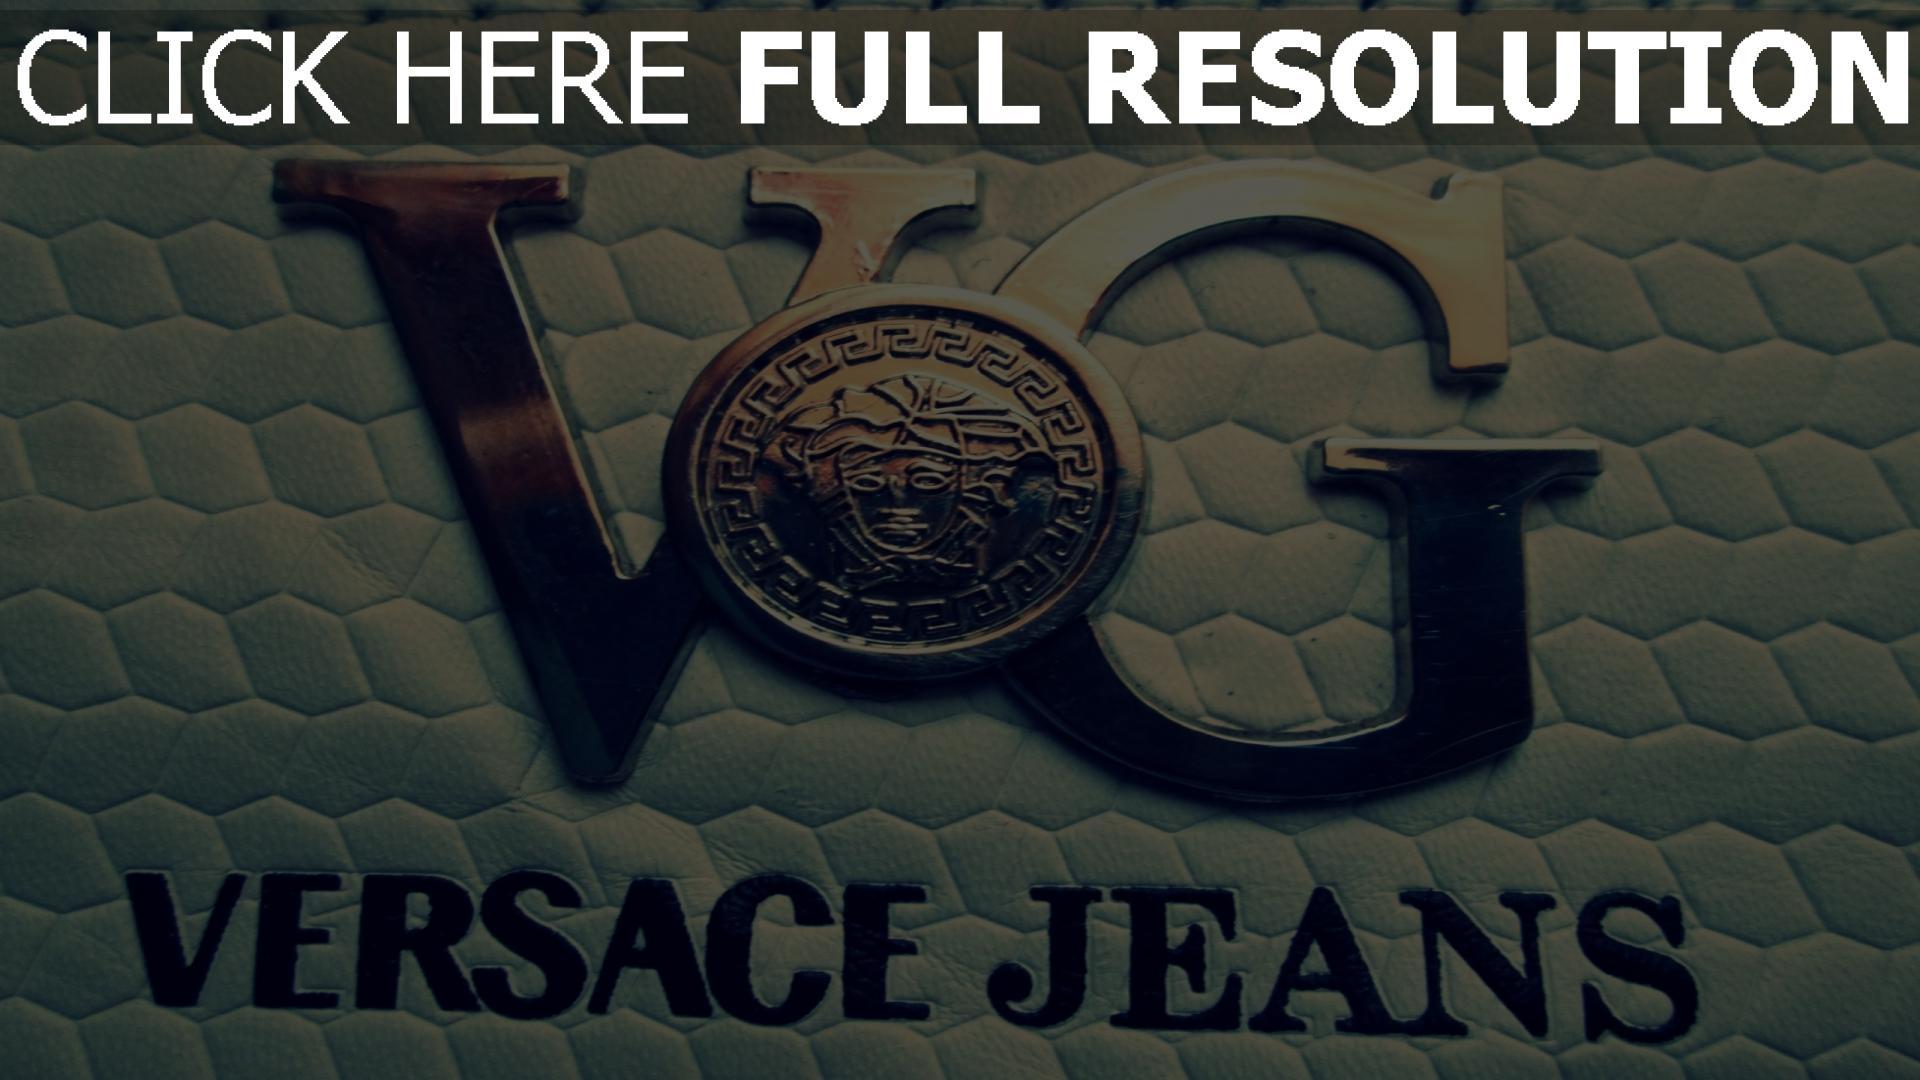 hd hintergrundbilder versace jeans logo form metall leder 1920x1080